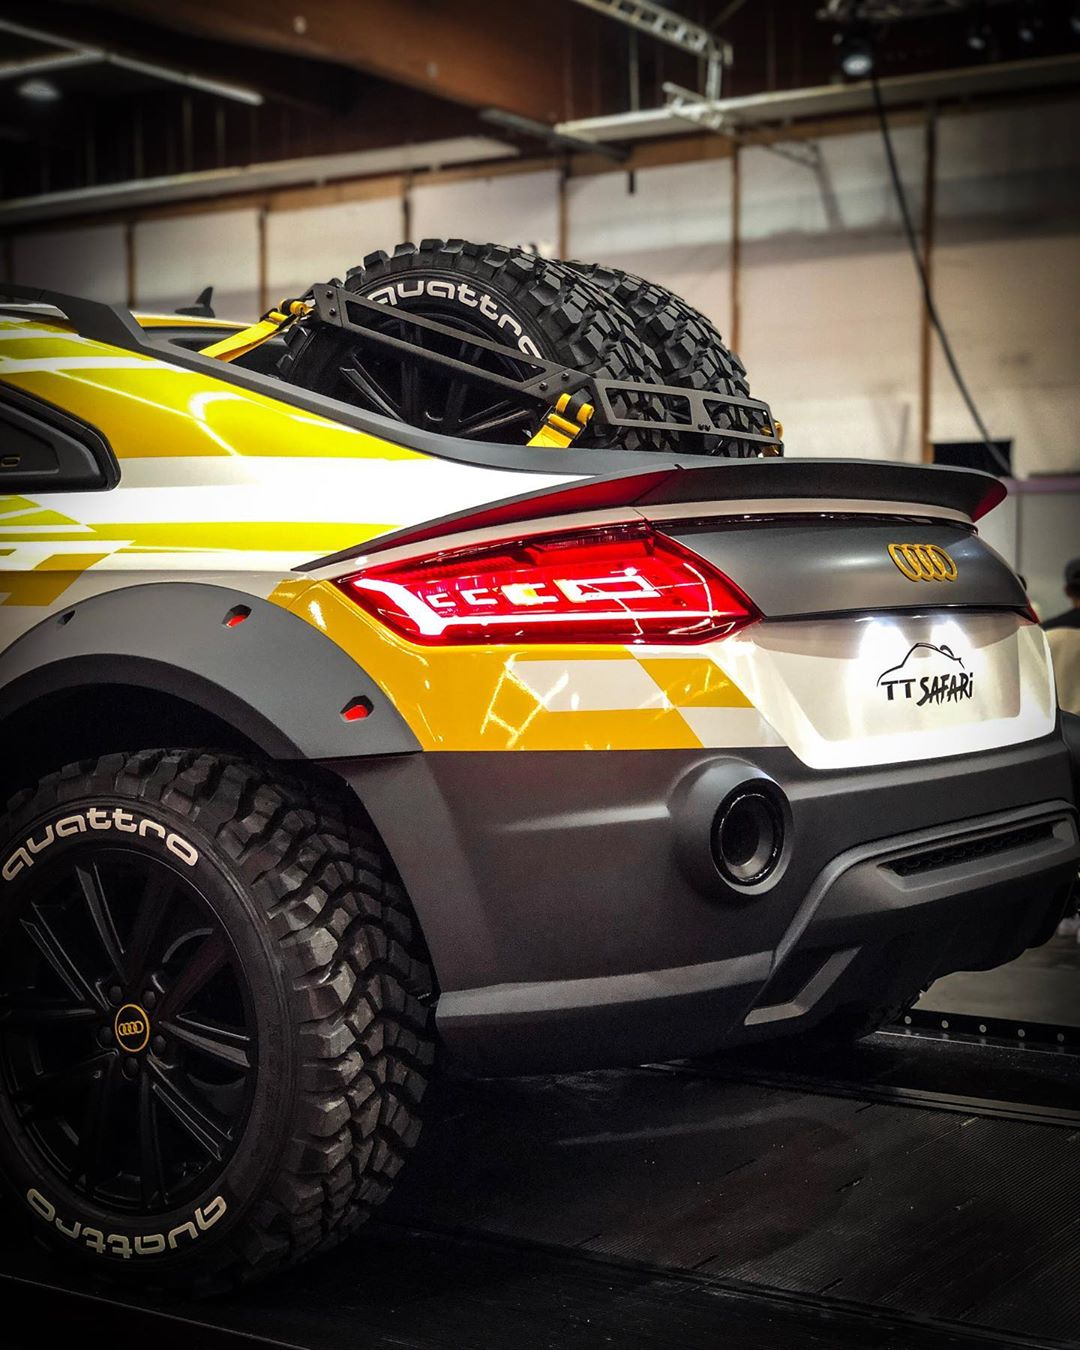 Audi Tt Safari Revealed Looks Like Full Size Hot Wheels Autoevolution